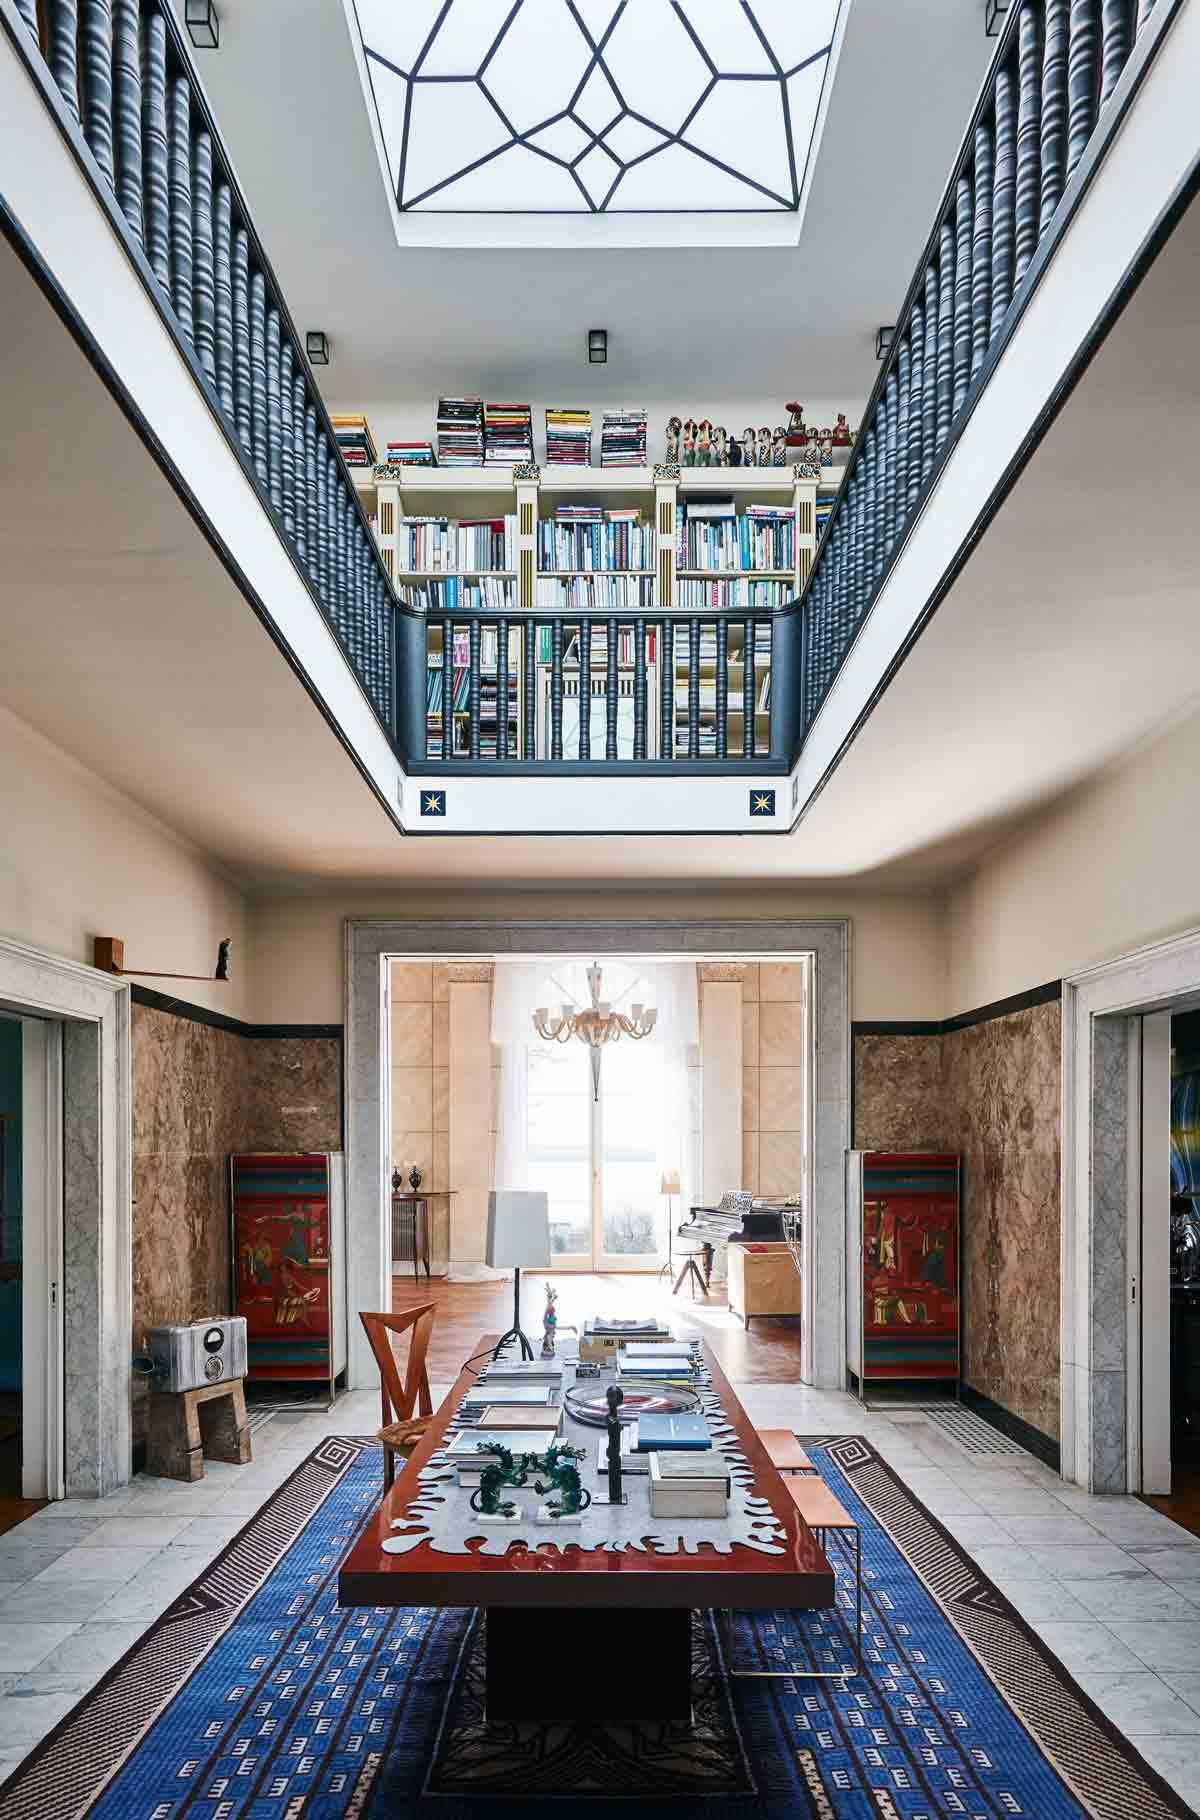 see inside karl lagerfeld 39 s fabulous hamburg home. Black Bedroom Furniture Sets. Home Design Ideas